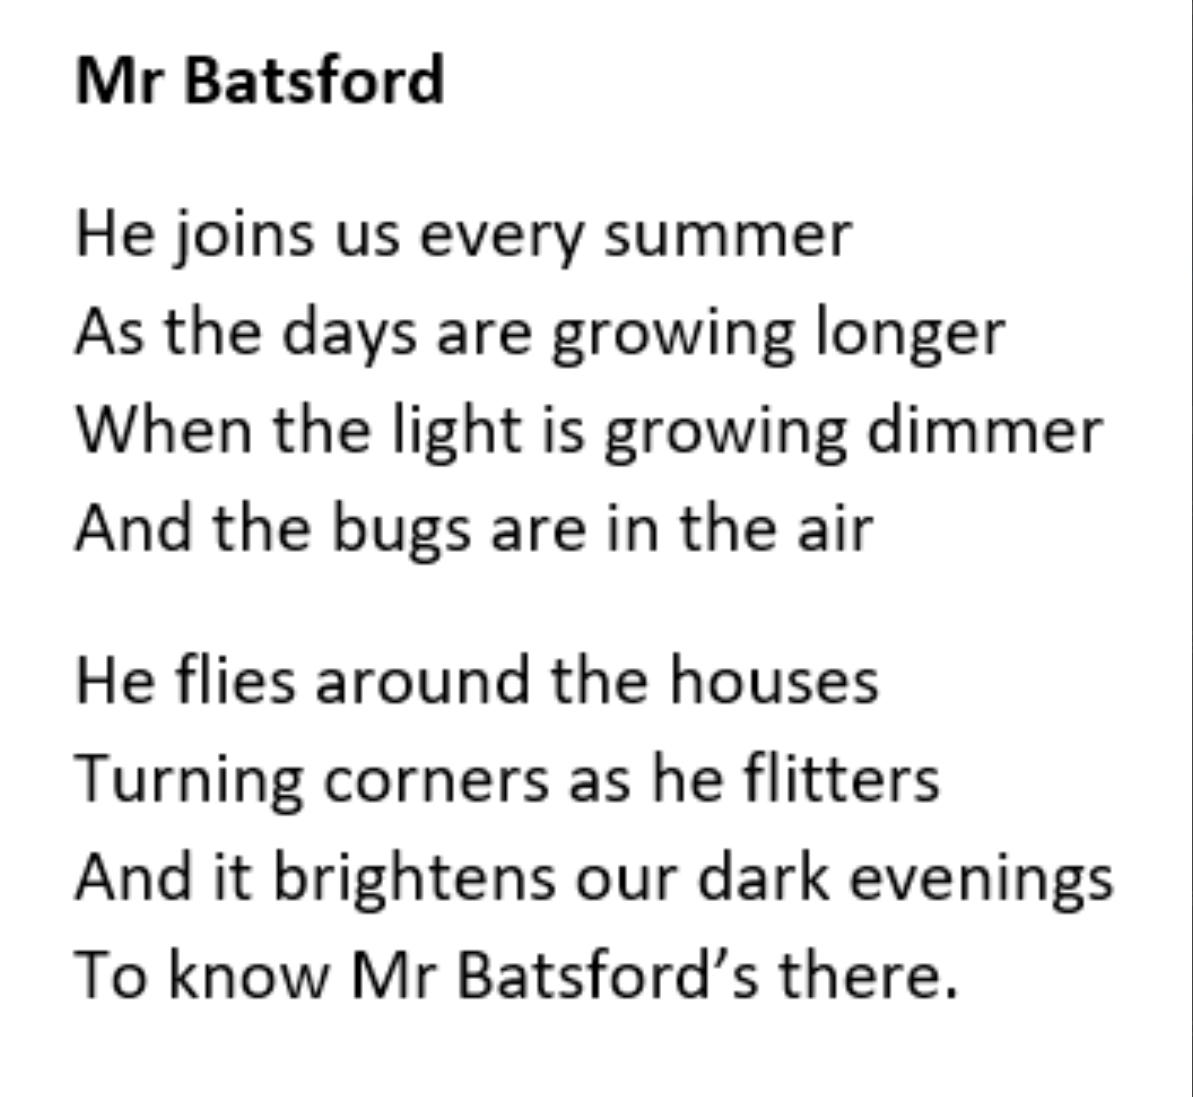 Mr Batsford